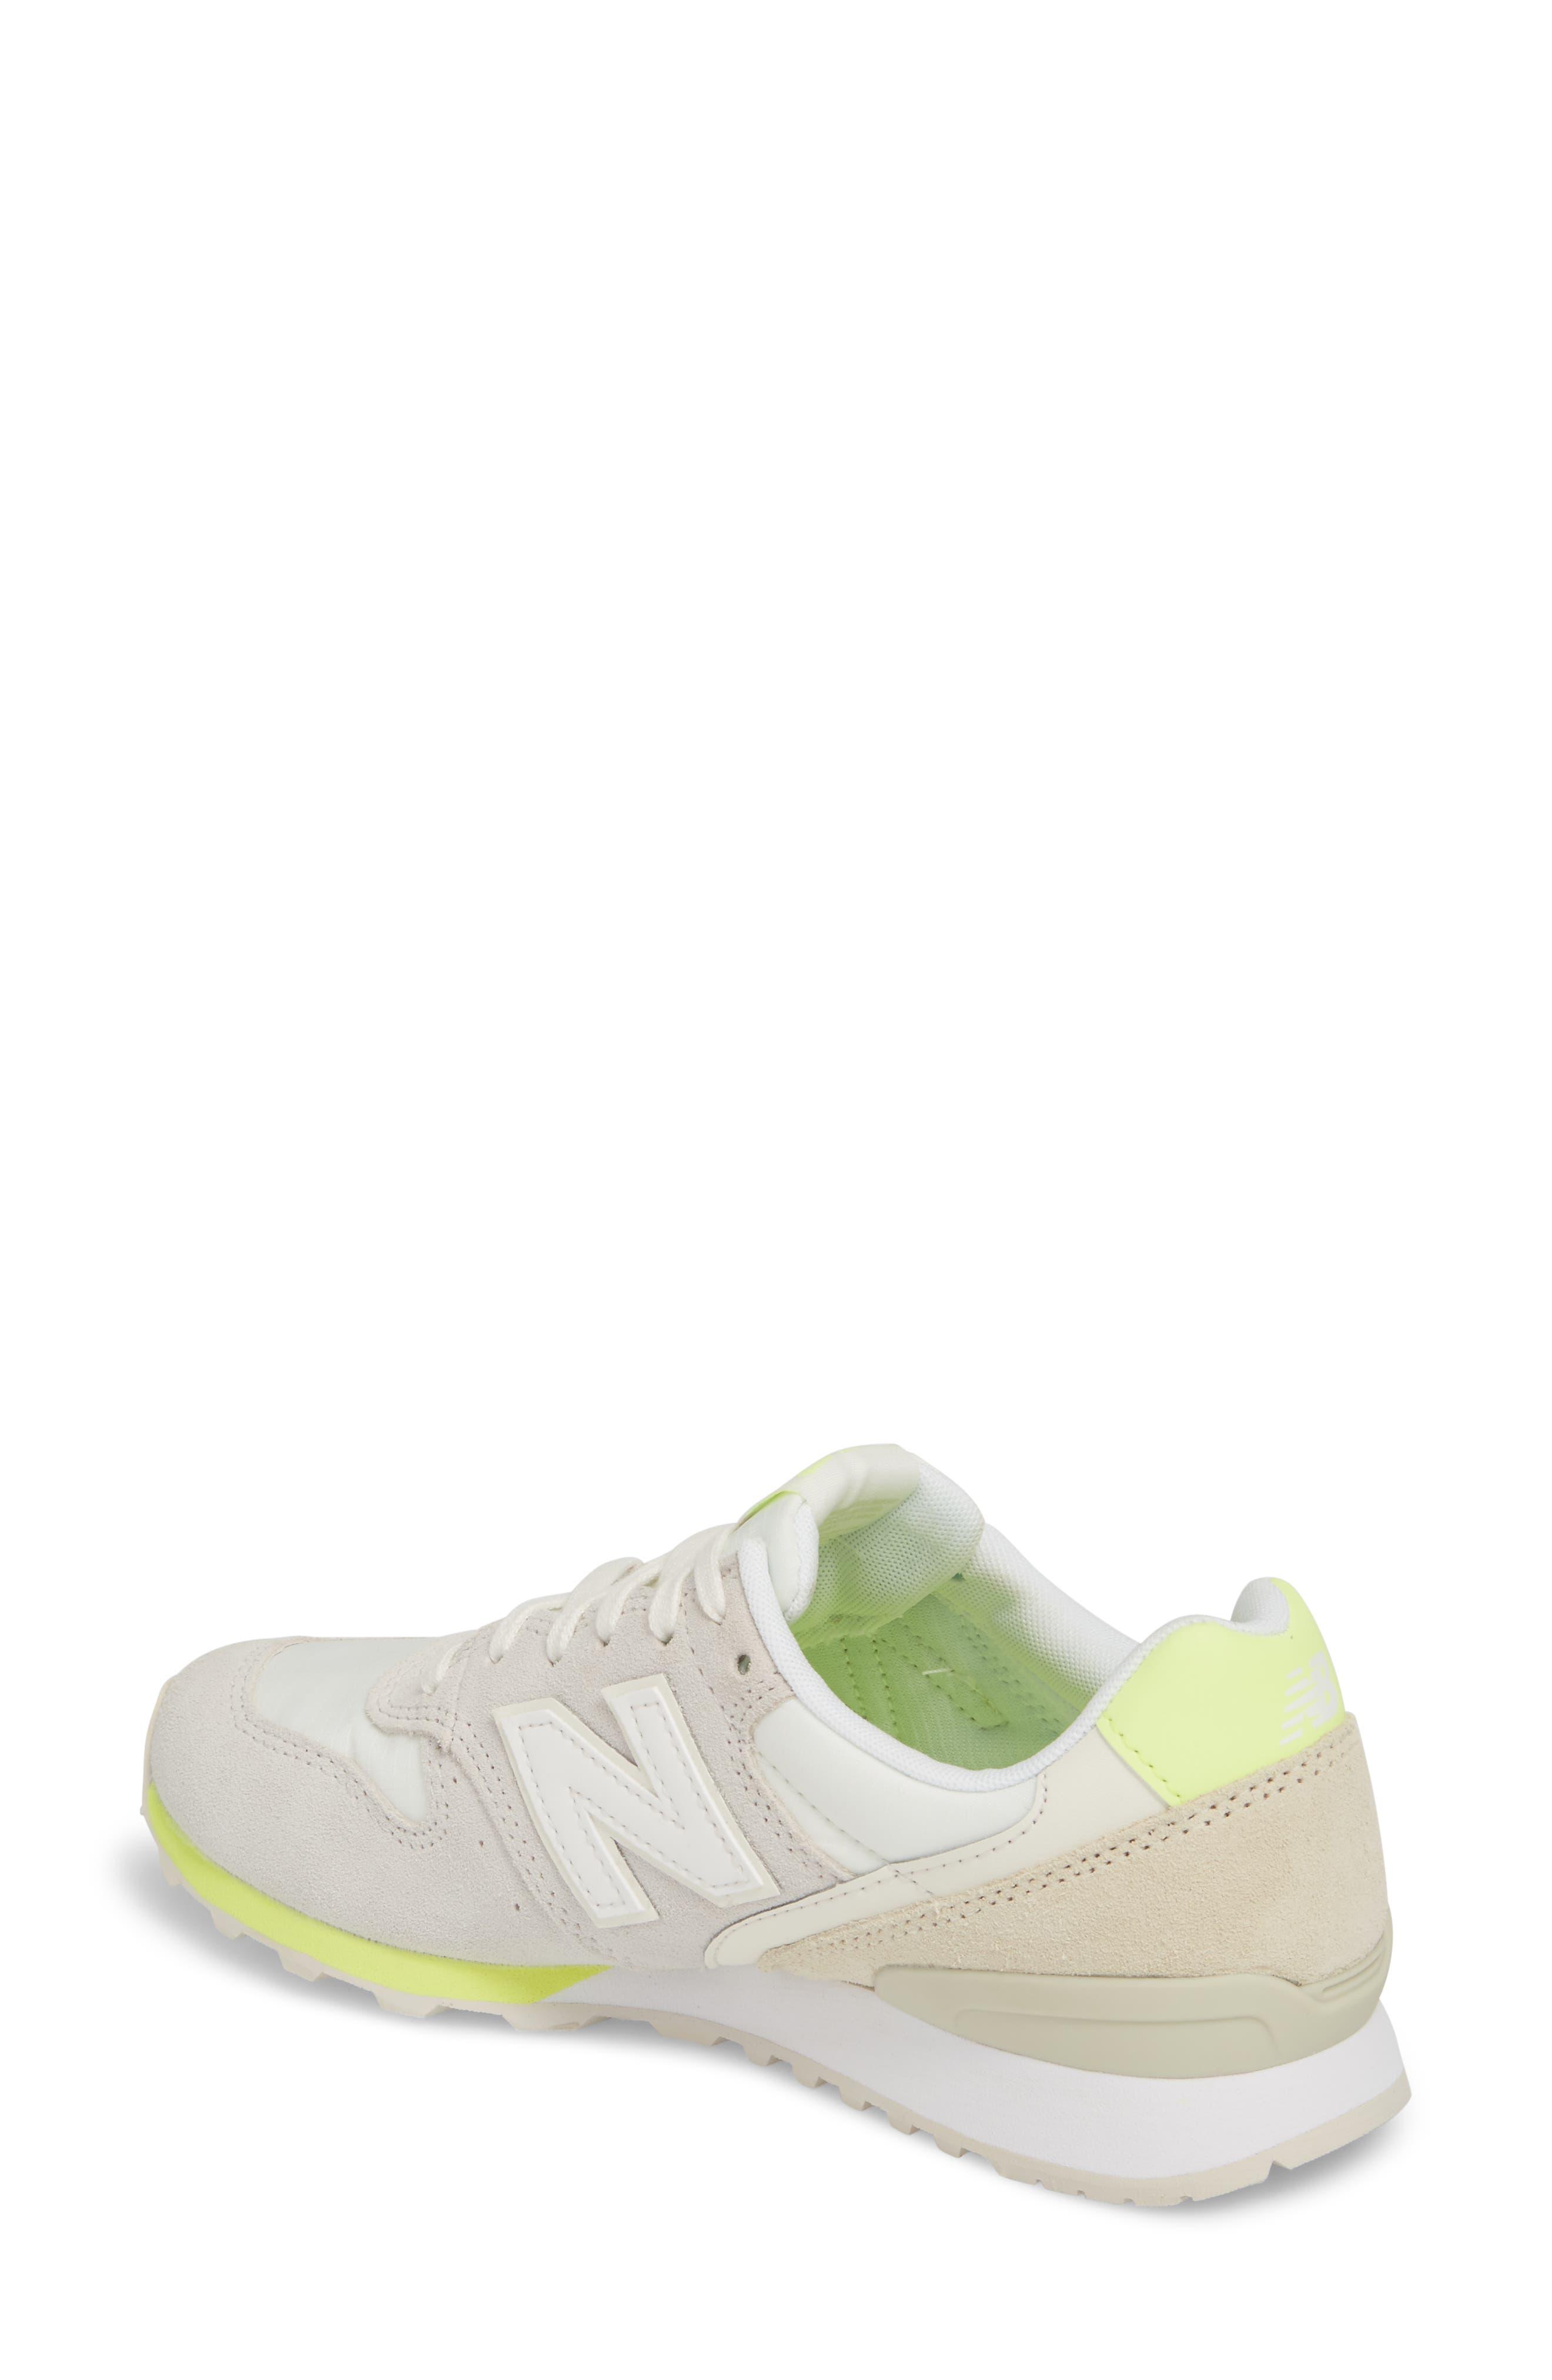 696 Suede Sneaker,                             Alternate thumbnail 2, color,                             250